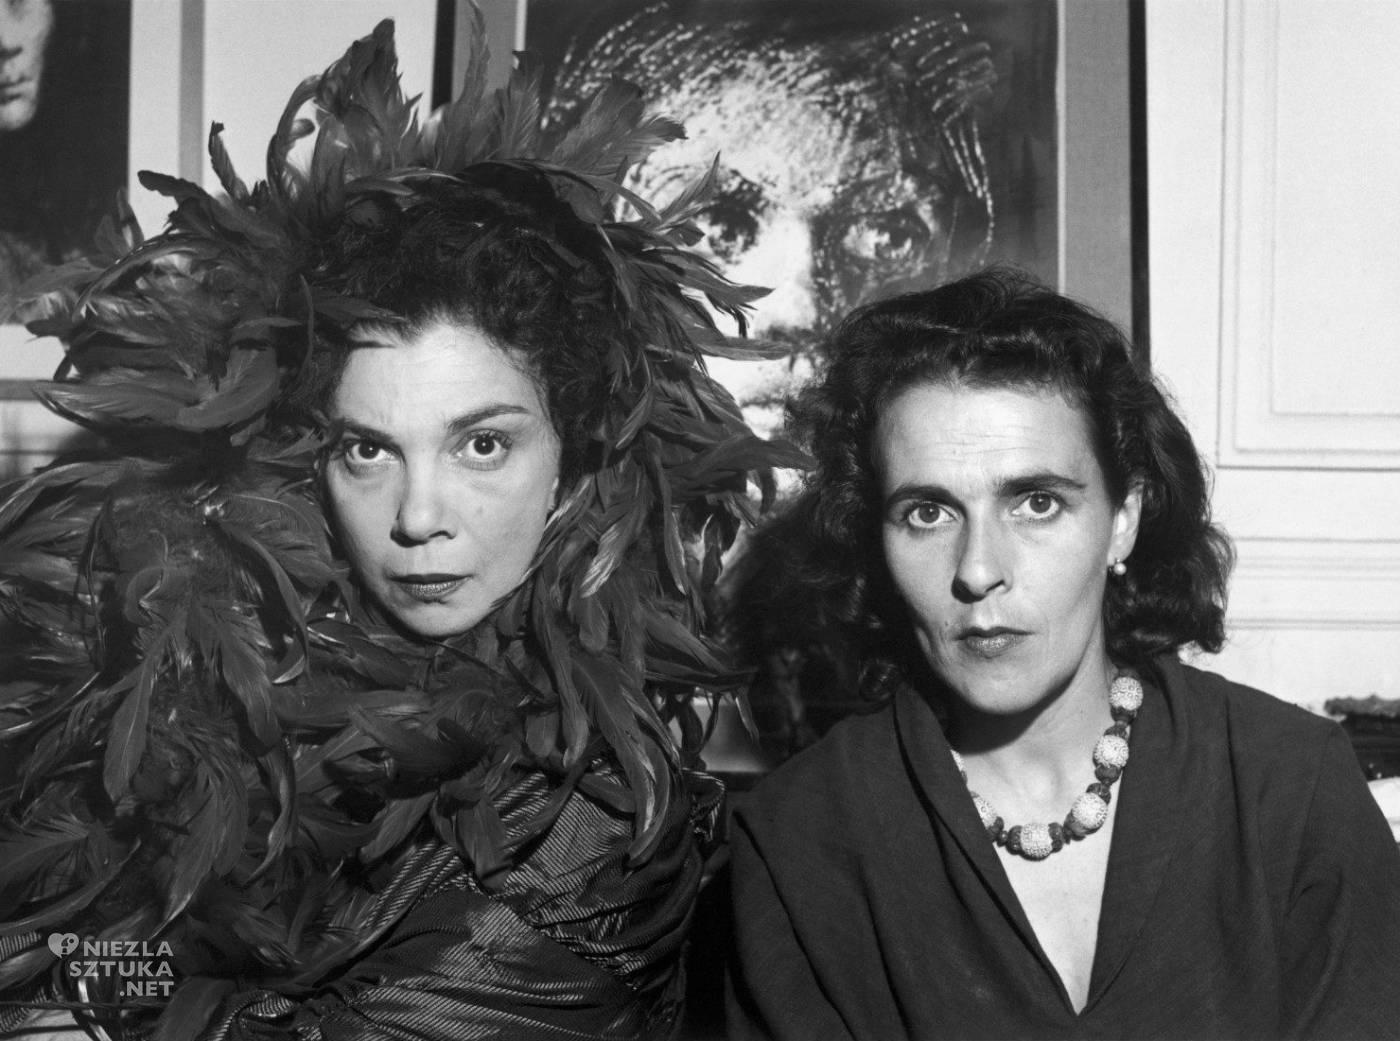 Leonora Carrington, Leonor Fini, fotografia, surrealistki, kobiety w sztuce, niezła sztuka